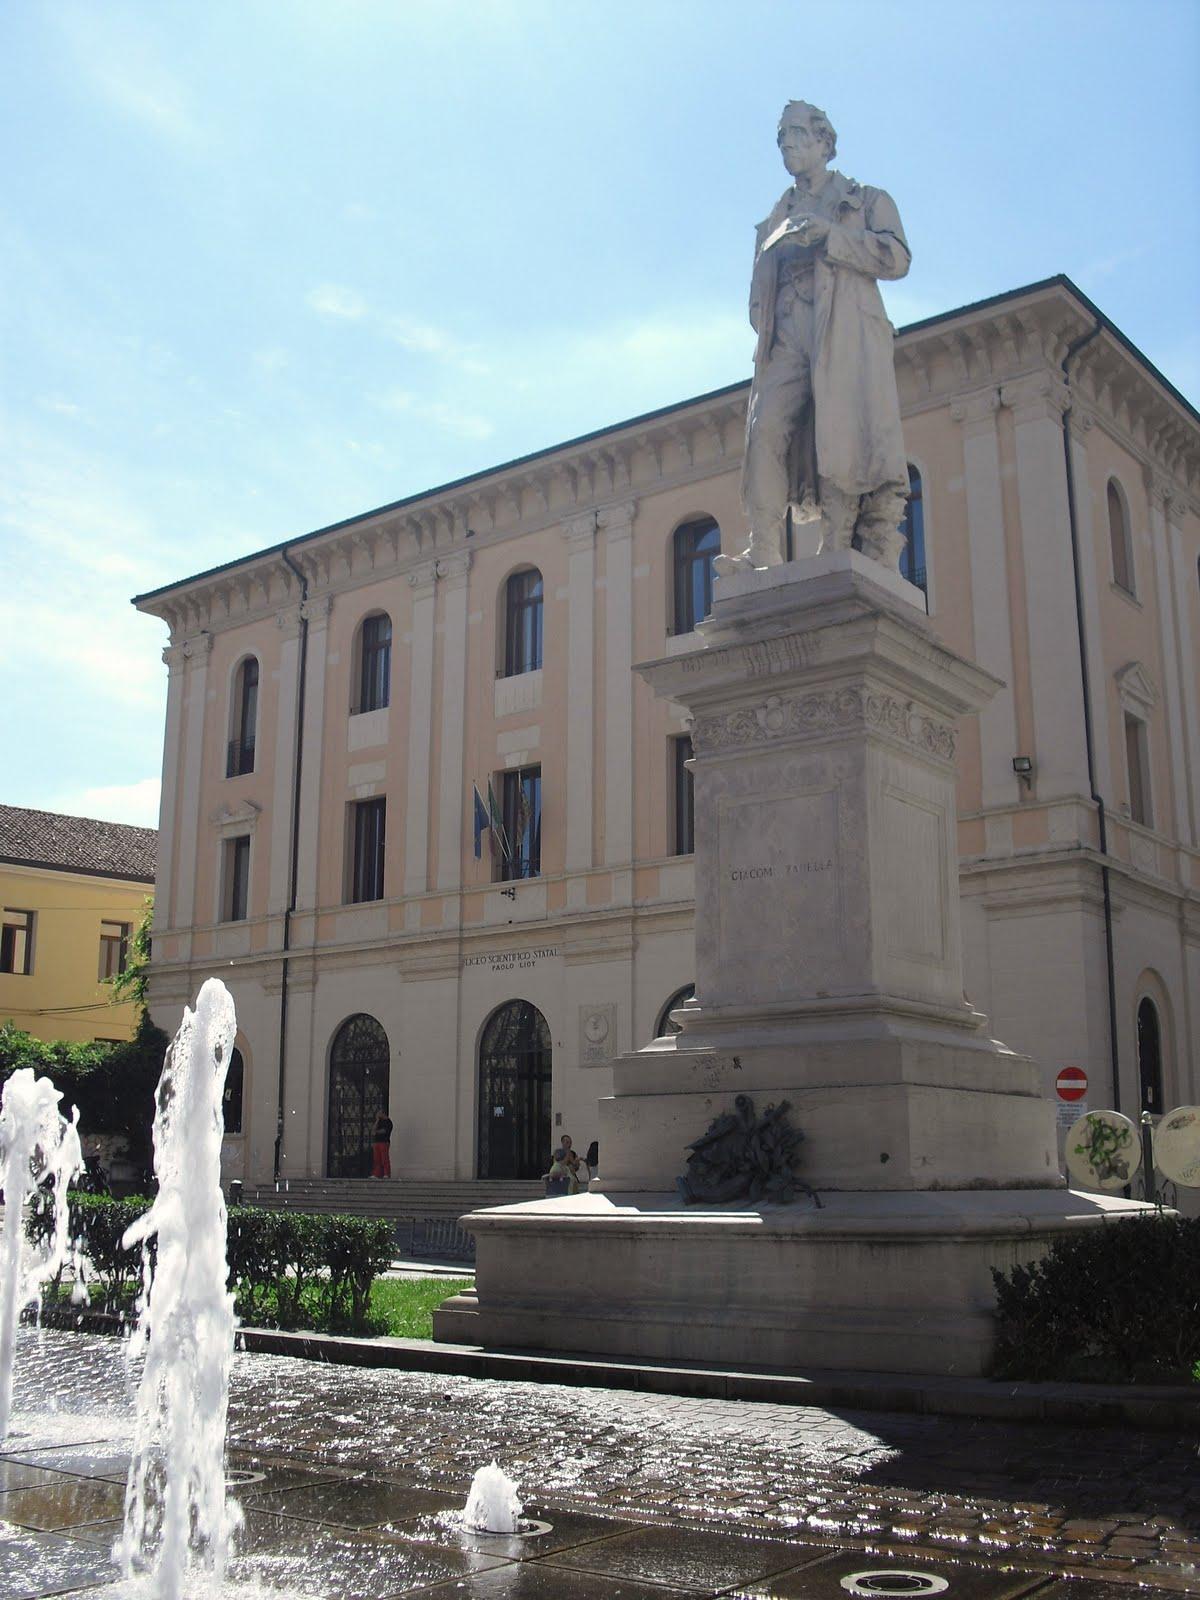 liceo biologico boscardin vicenza italy - photo#13